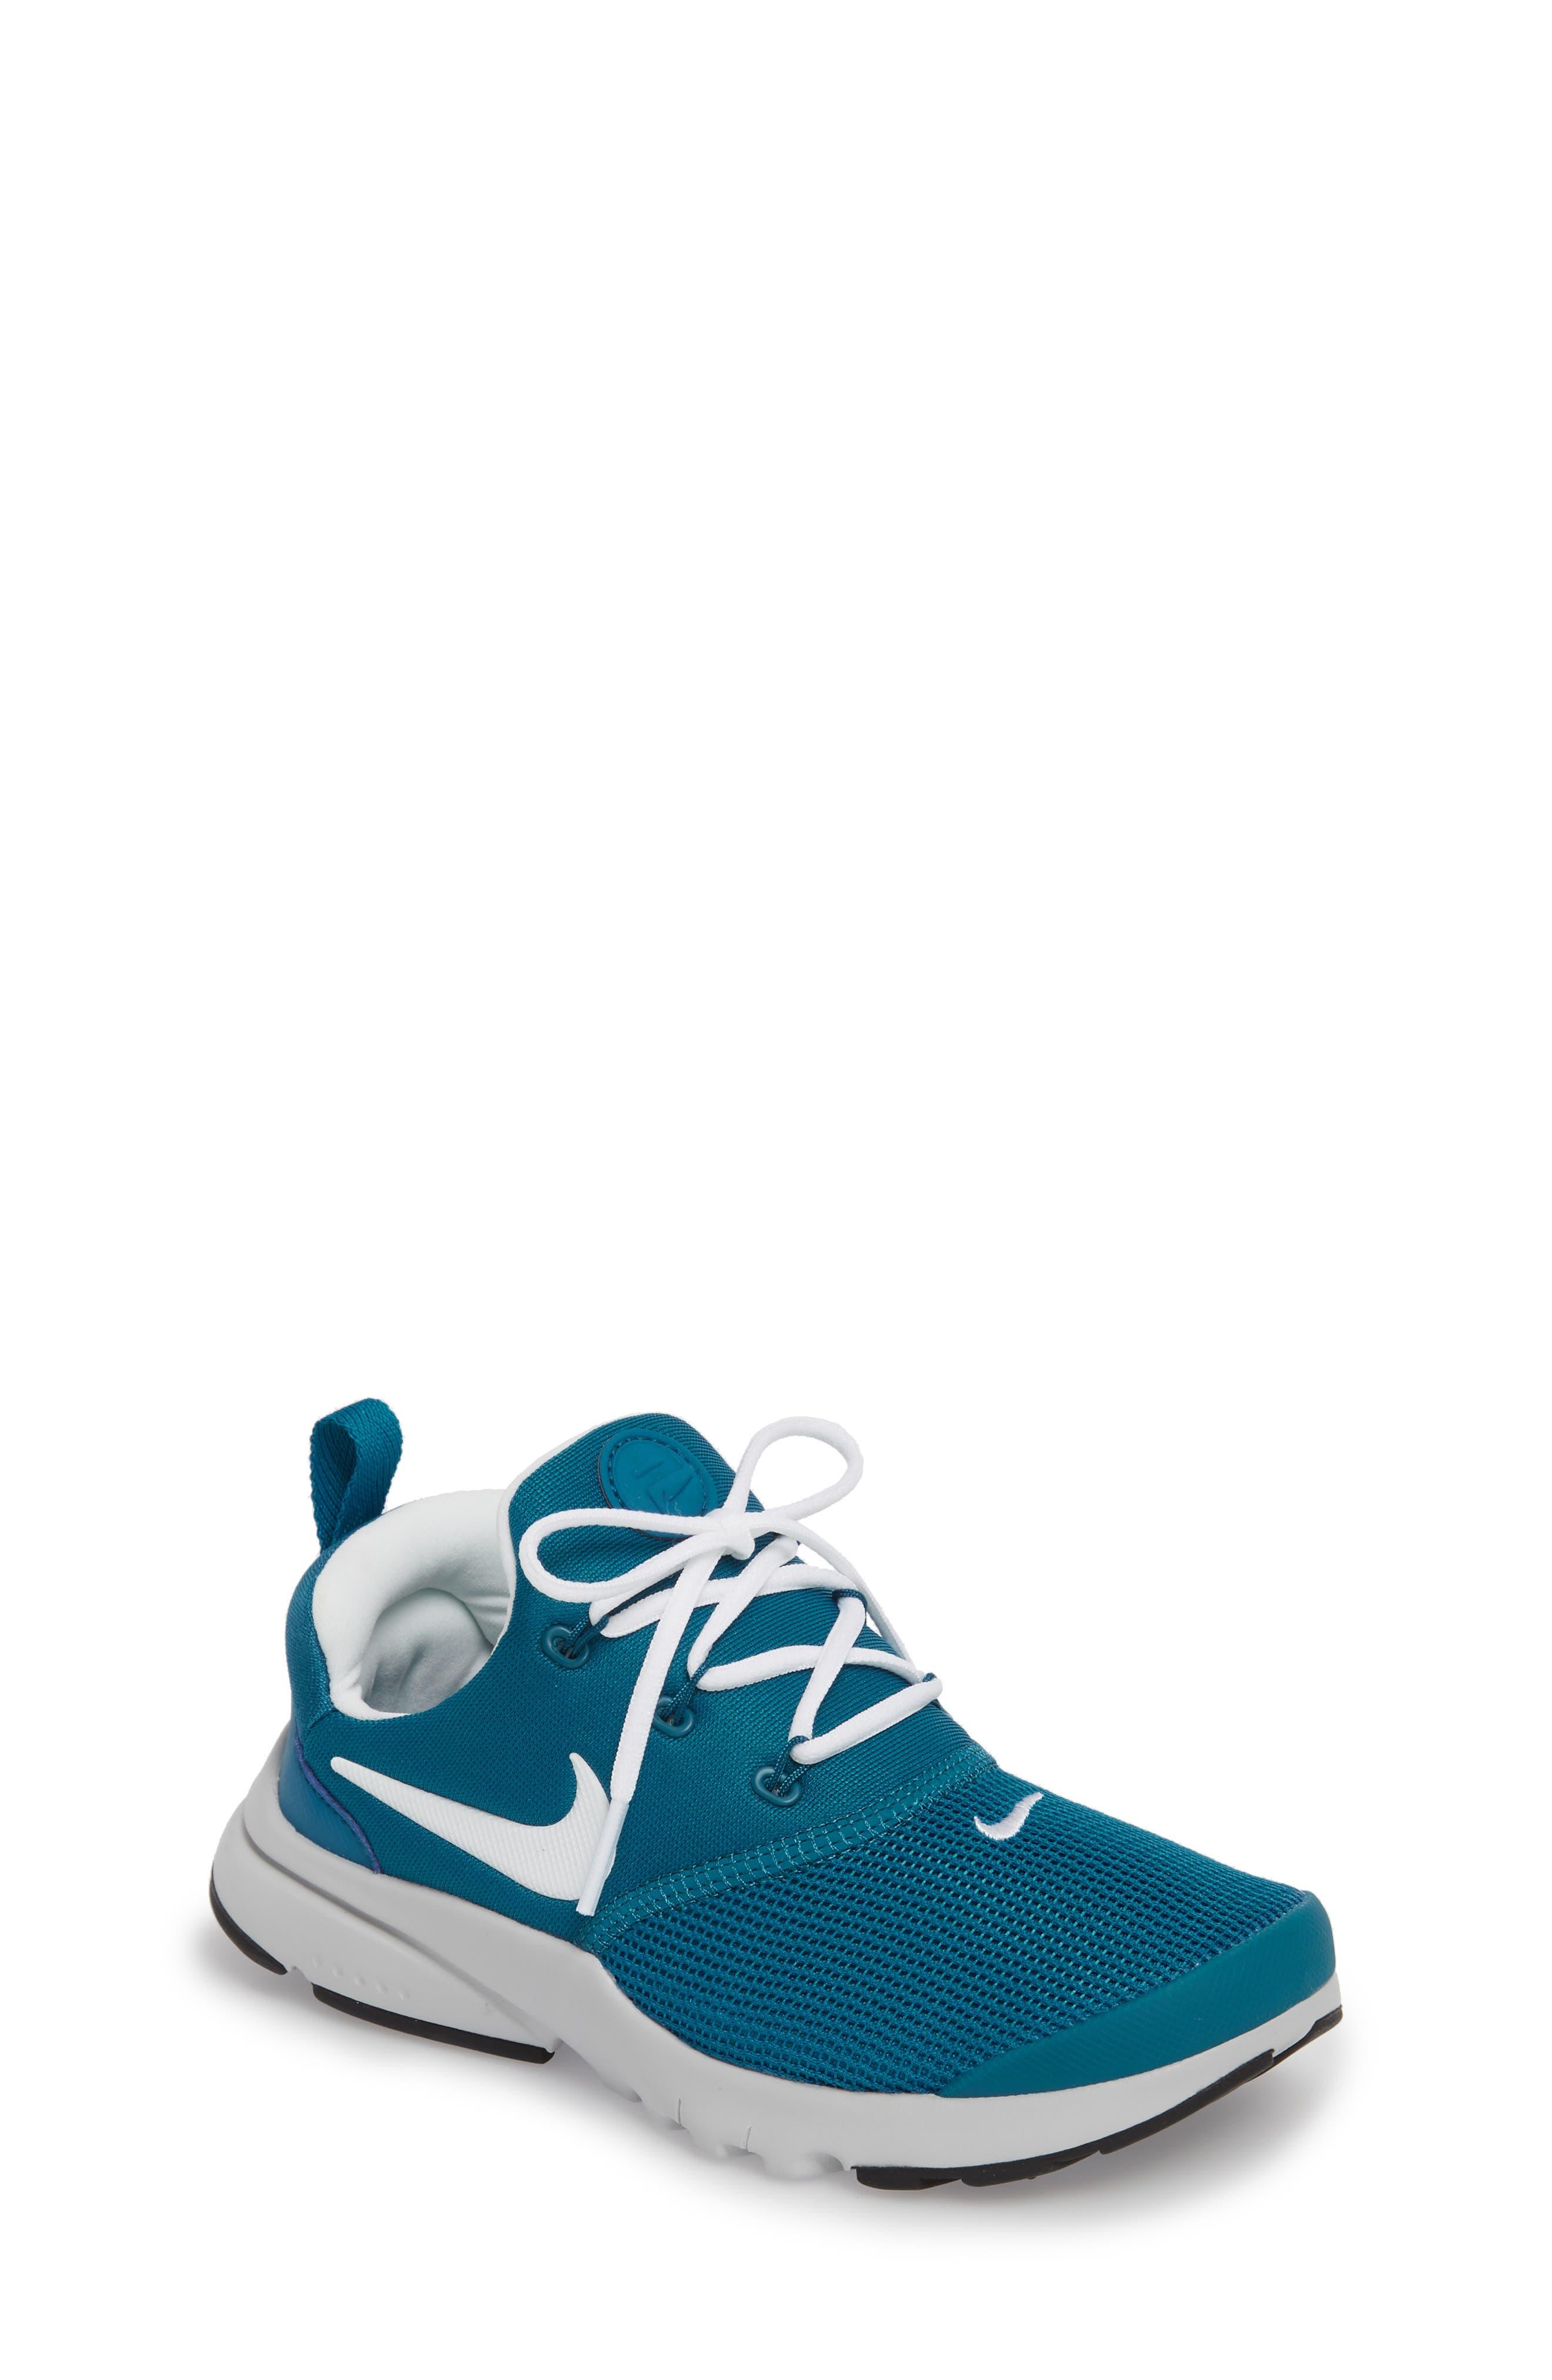 Presto Fly Sneaker,                             Main thumbnail 1, color,                             Green Abyss/ Platinum/ Black